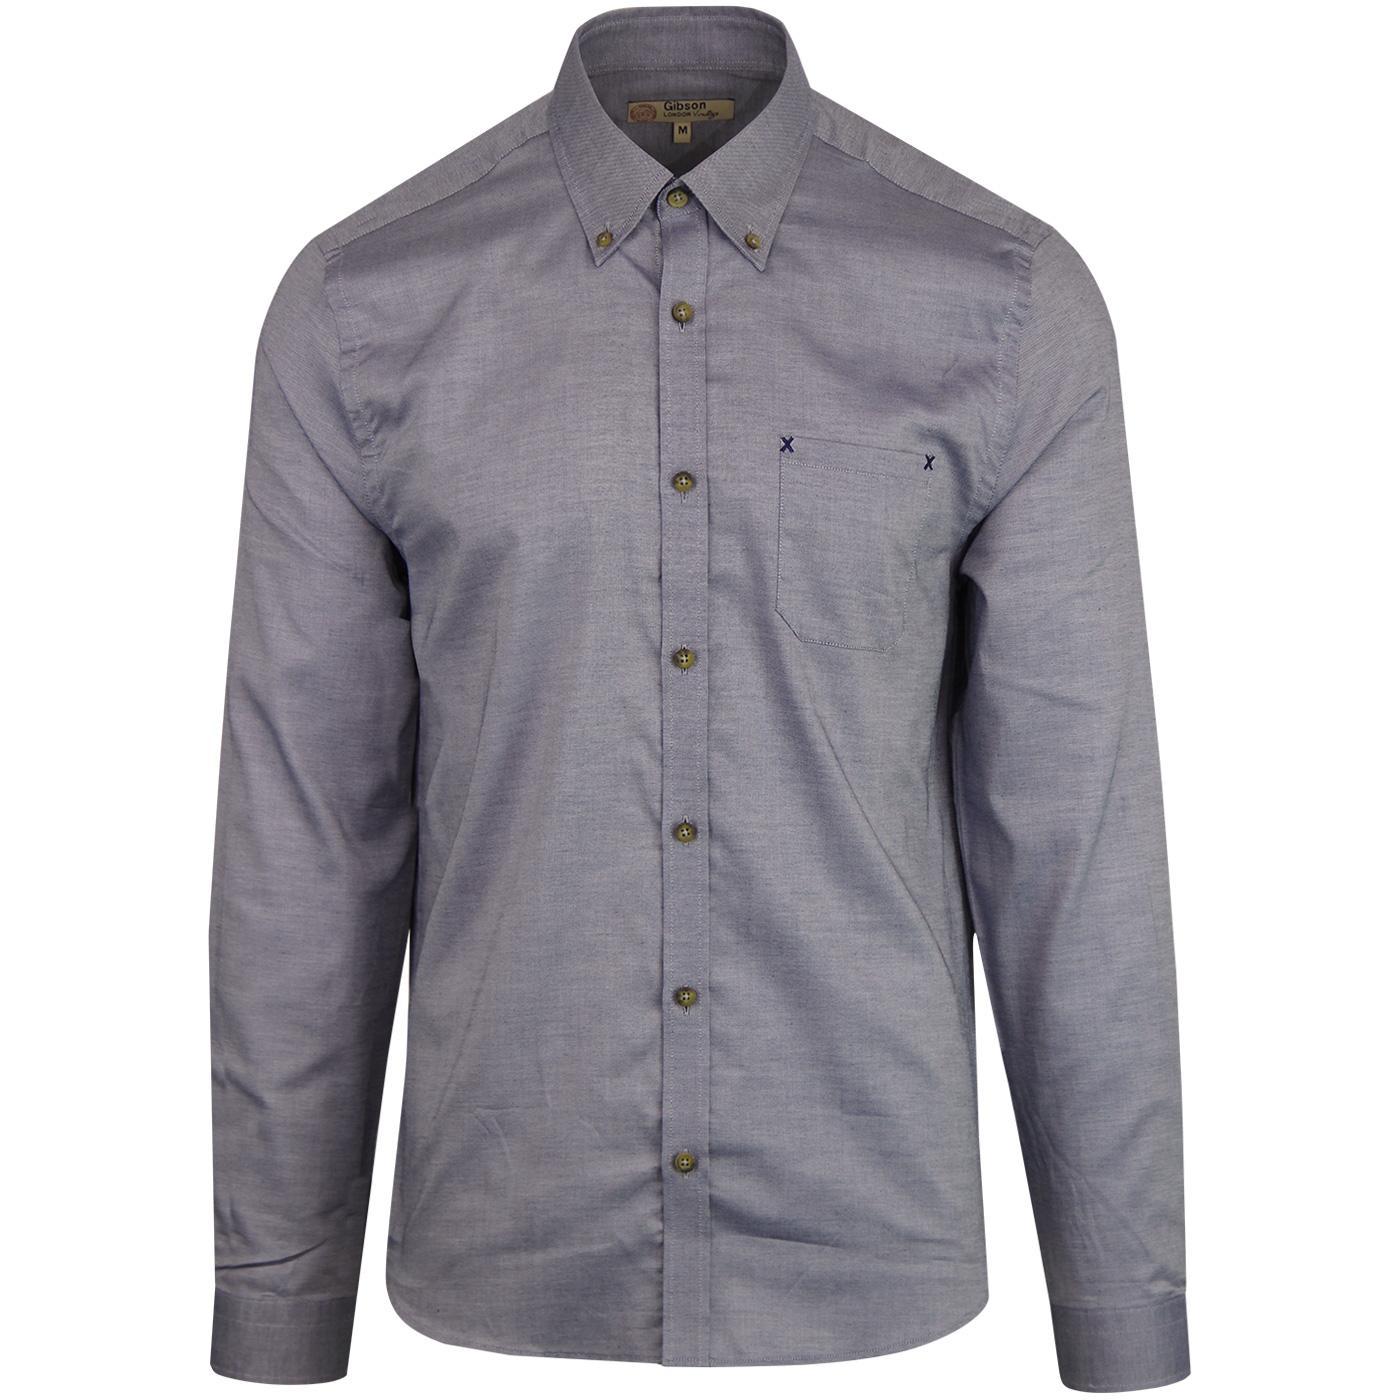 GIBSON LONDON Mens Retro Smart Oxford Shirt Blue